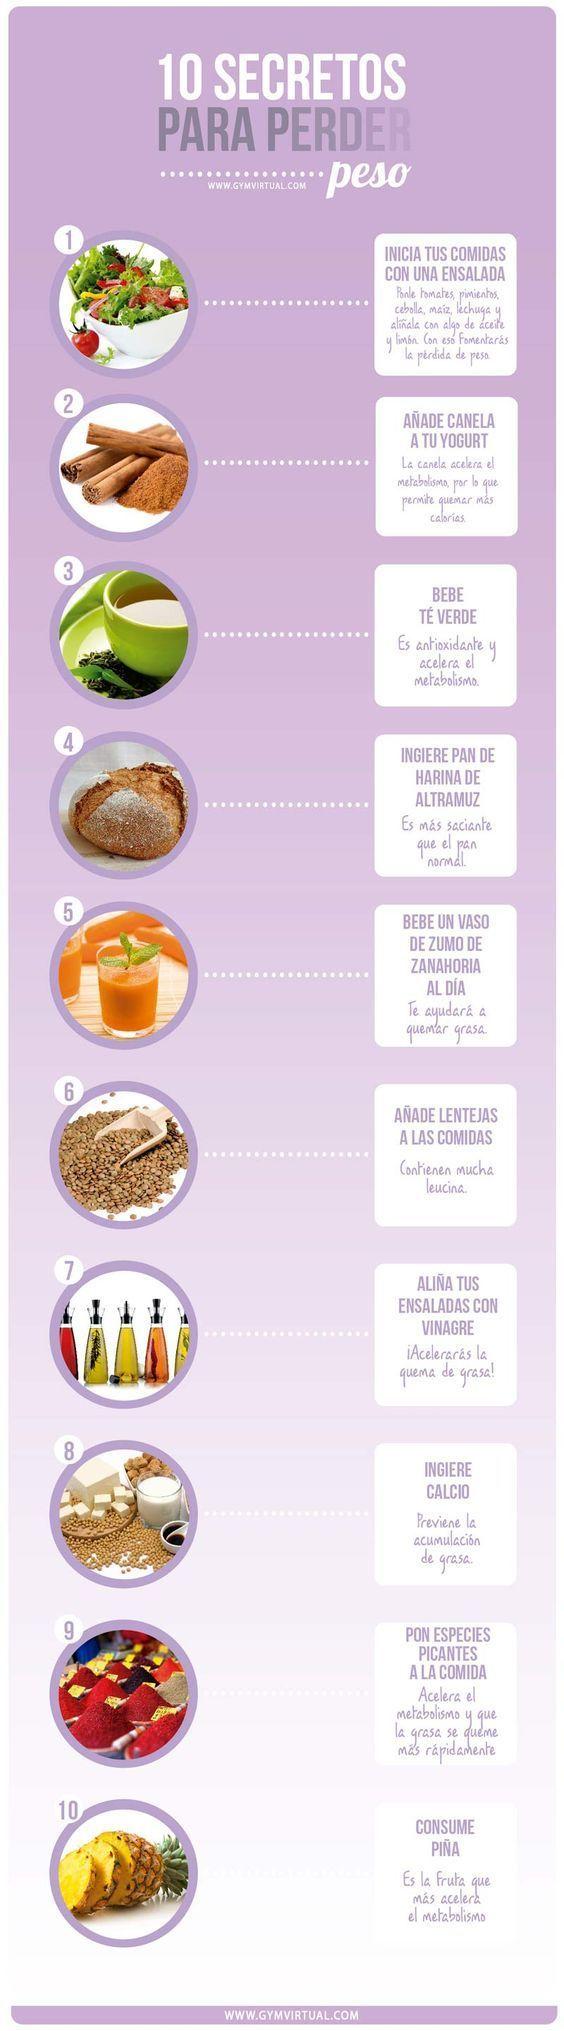 10 Secretos Para Perder Peso Dietas Quema Grasa Pinterest  ~ Aprender A Comer Bien Para Adelgazar